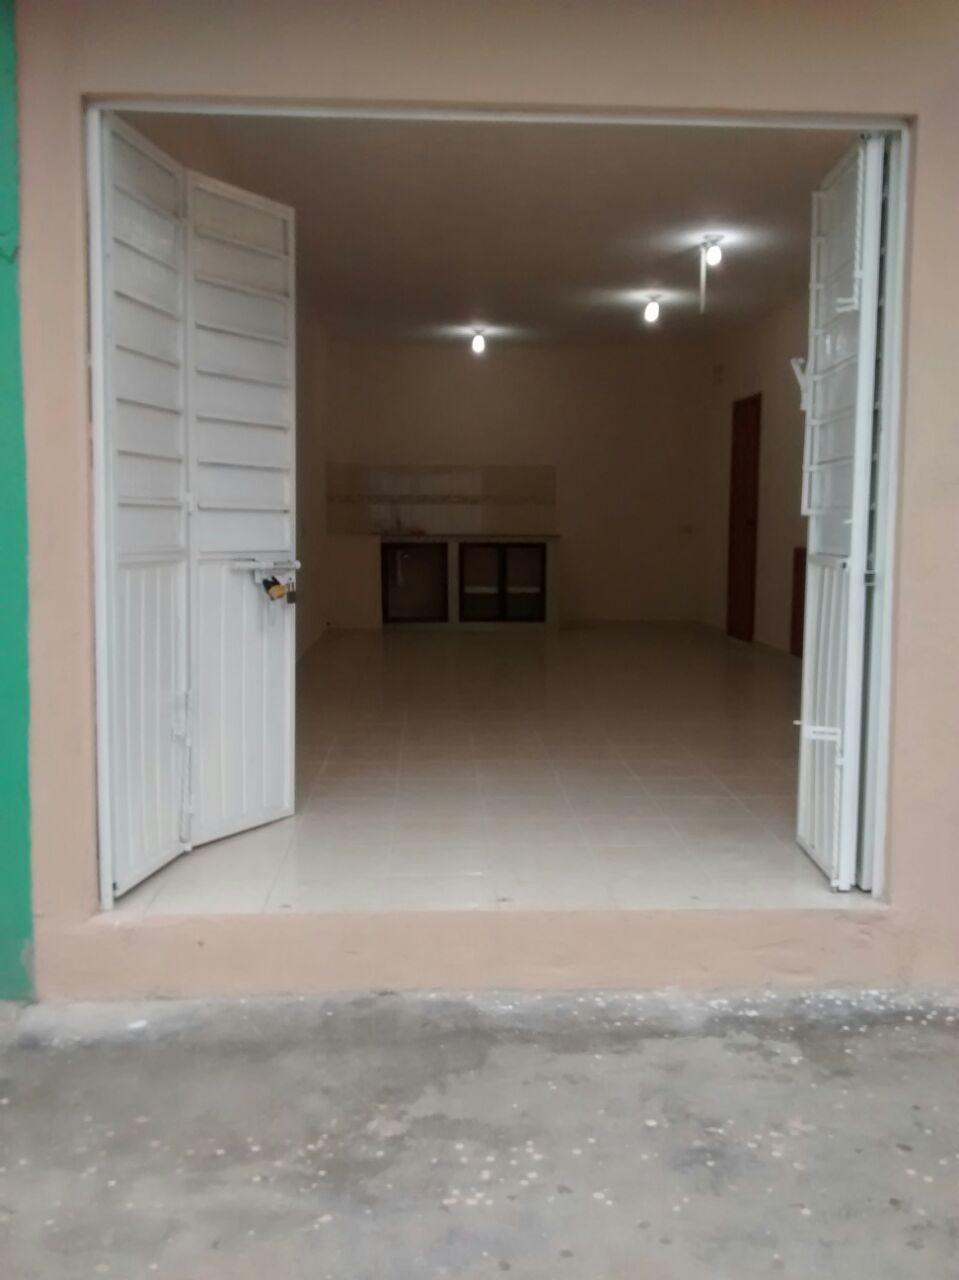 Local comercial en Renta Calle Juan Sosa Mazariego 235, Casi Esq. Limbano Blandin, Gaviotas Norte, Gaviotas Norte, Villahermosa